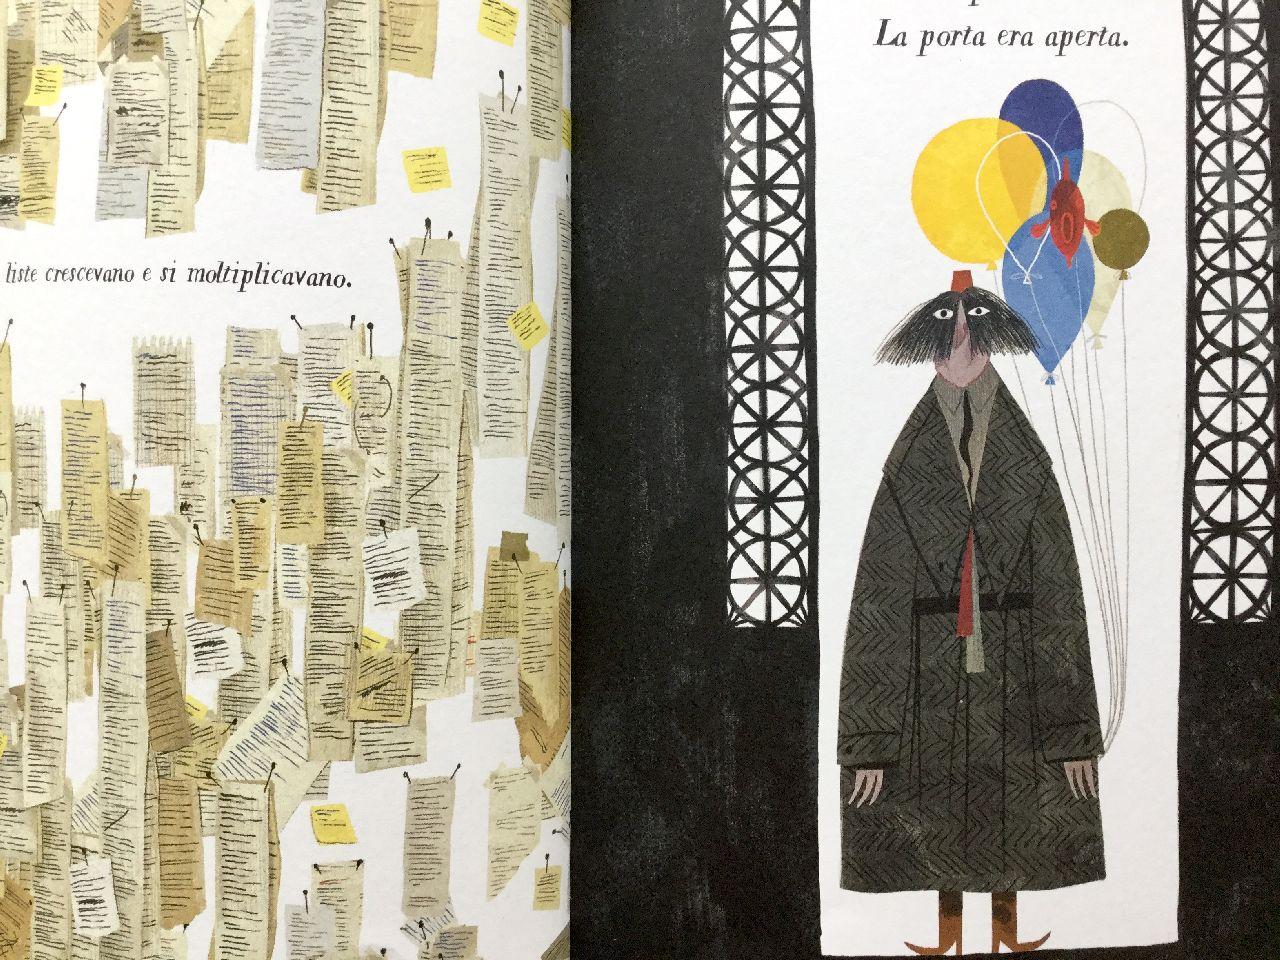 Kyo Maclear - Julia Sardà, La famiglia Lista, Rizzoli